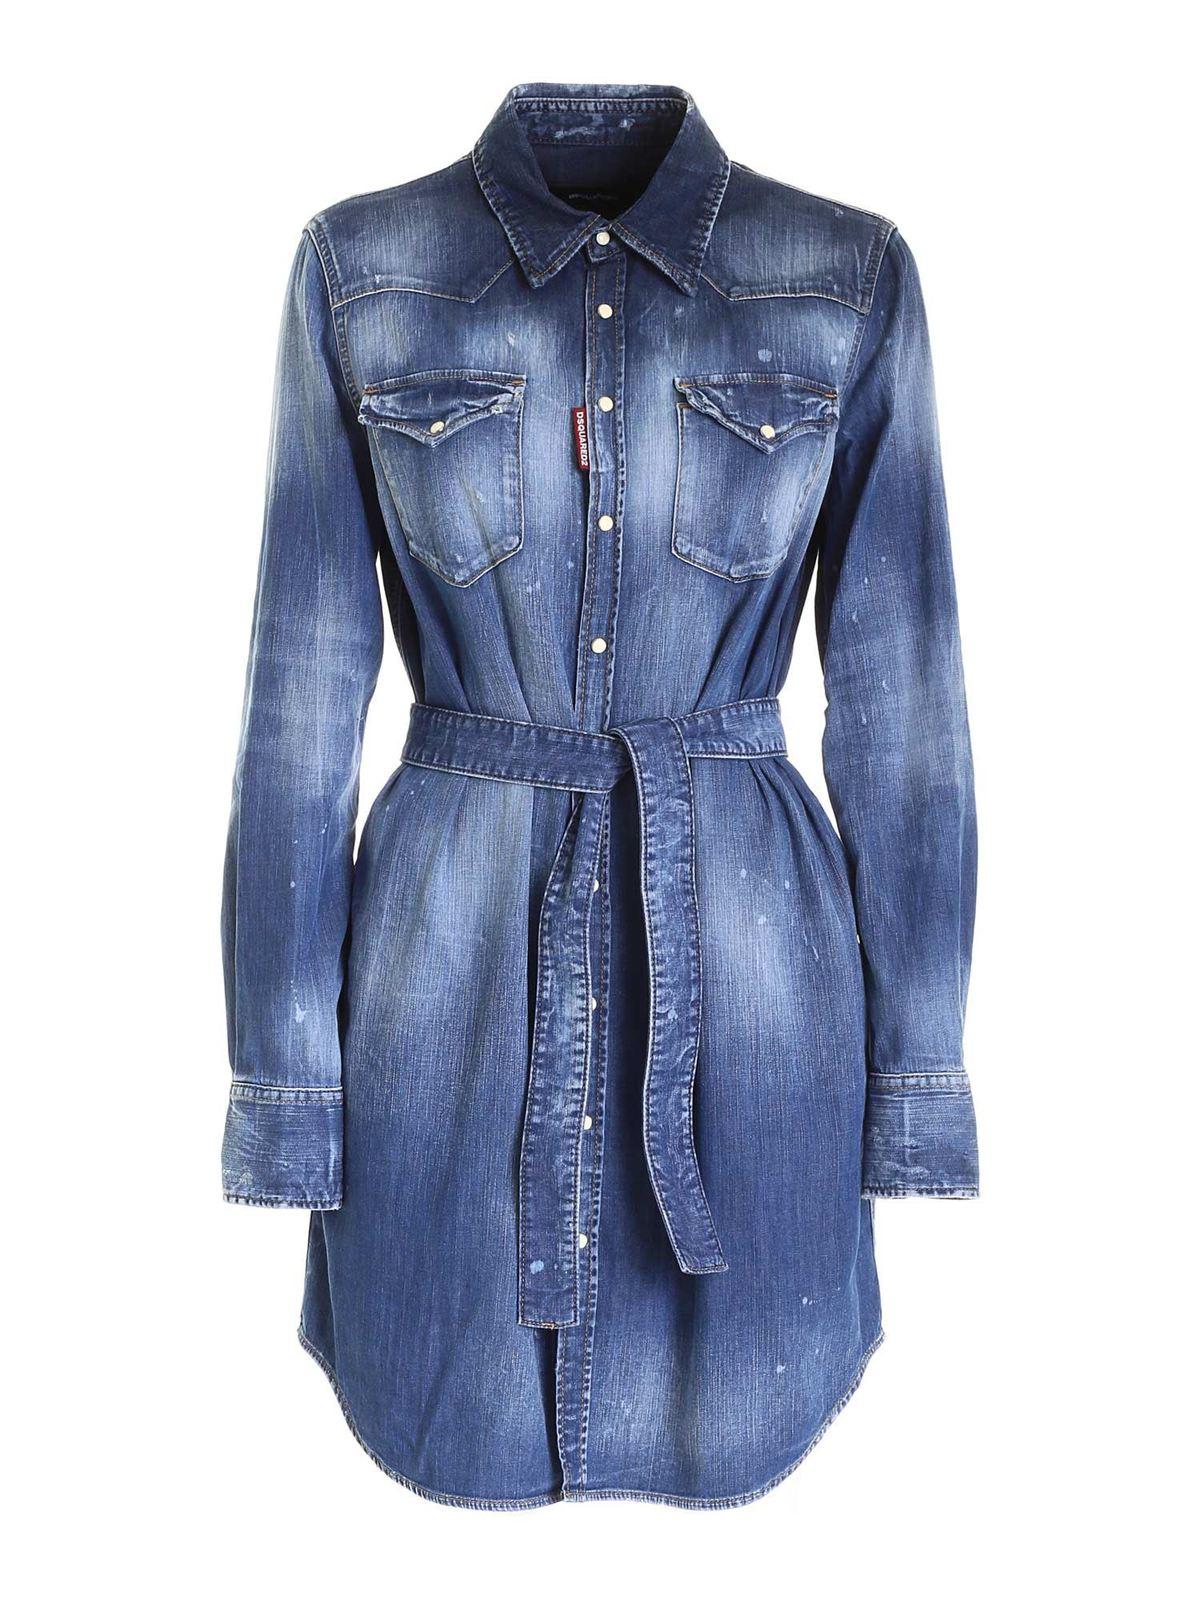 Dsquared2 Cottons BOYFRIEND SHIRT IN BLUE